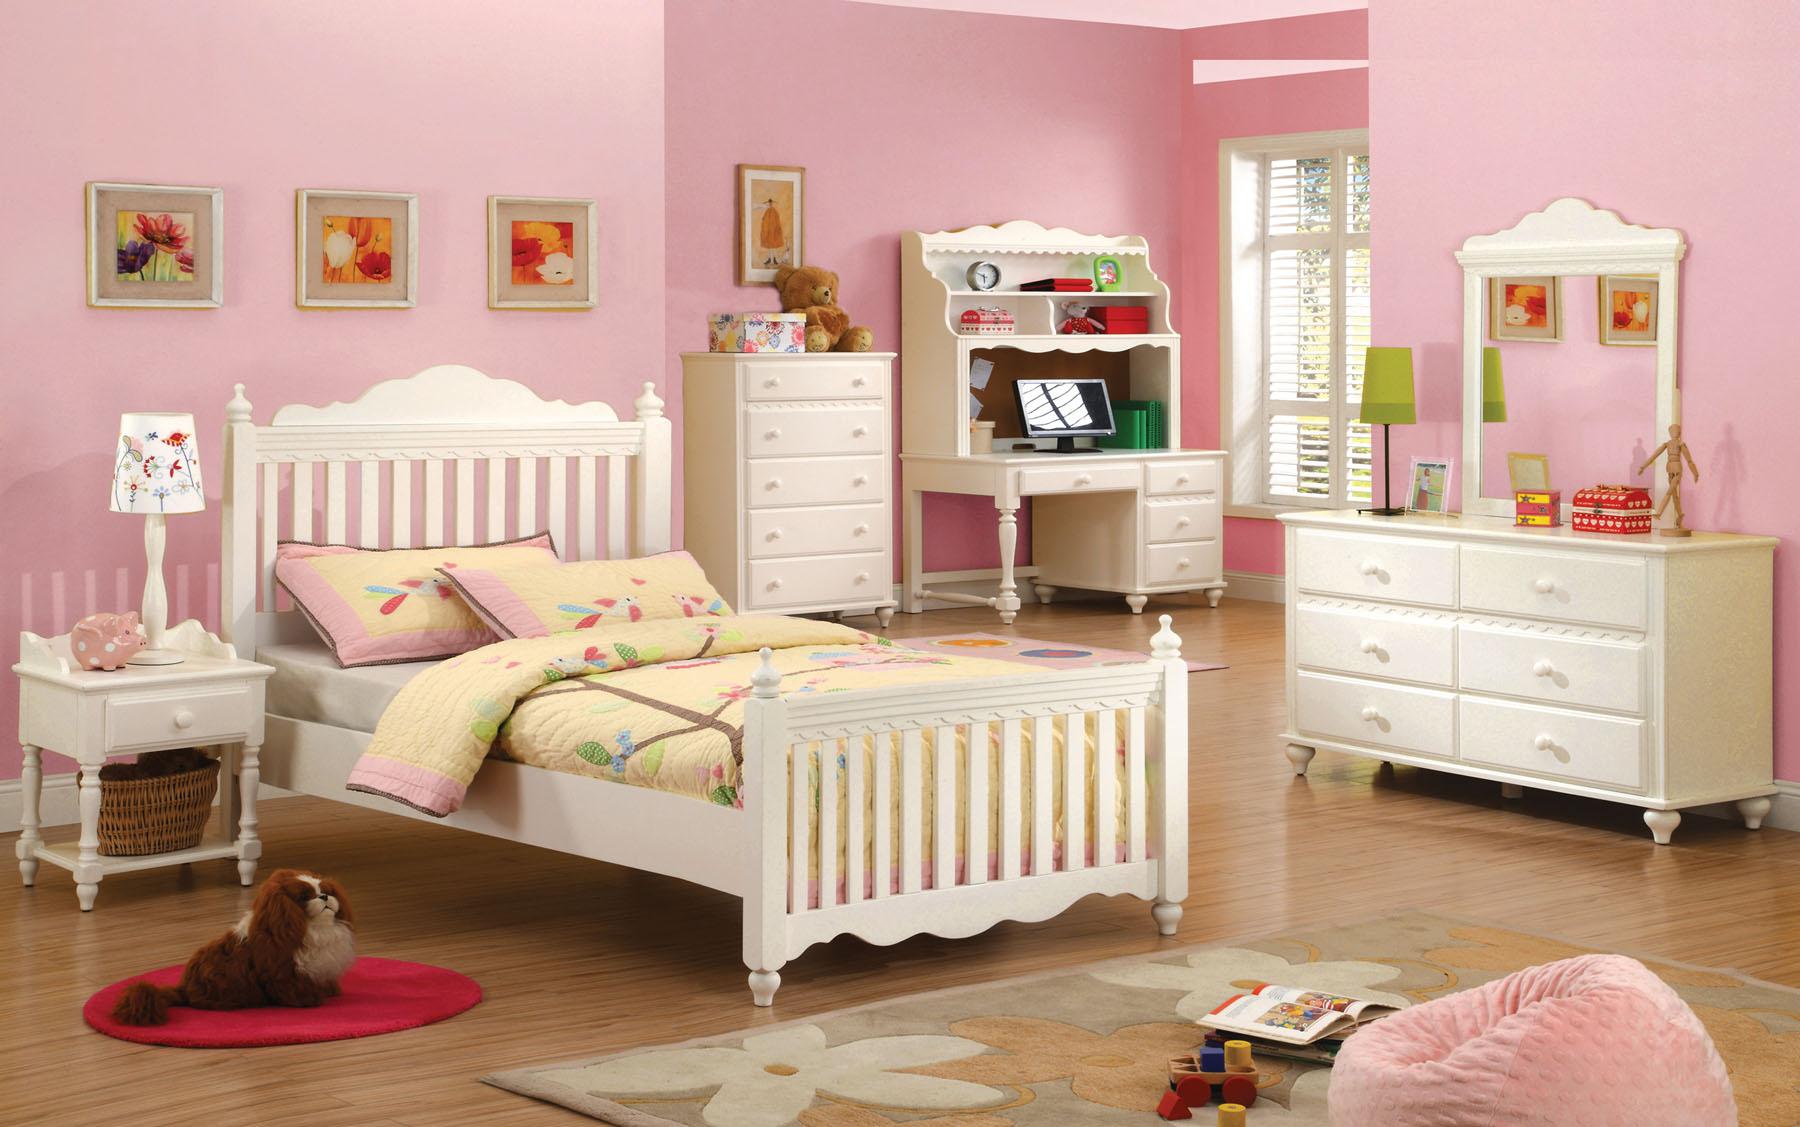 twin bedroom set 99 00 1098 00 white finish twin 4pc bedroom set